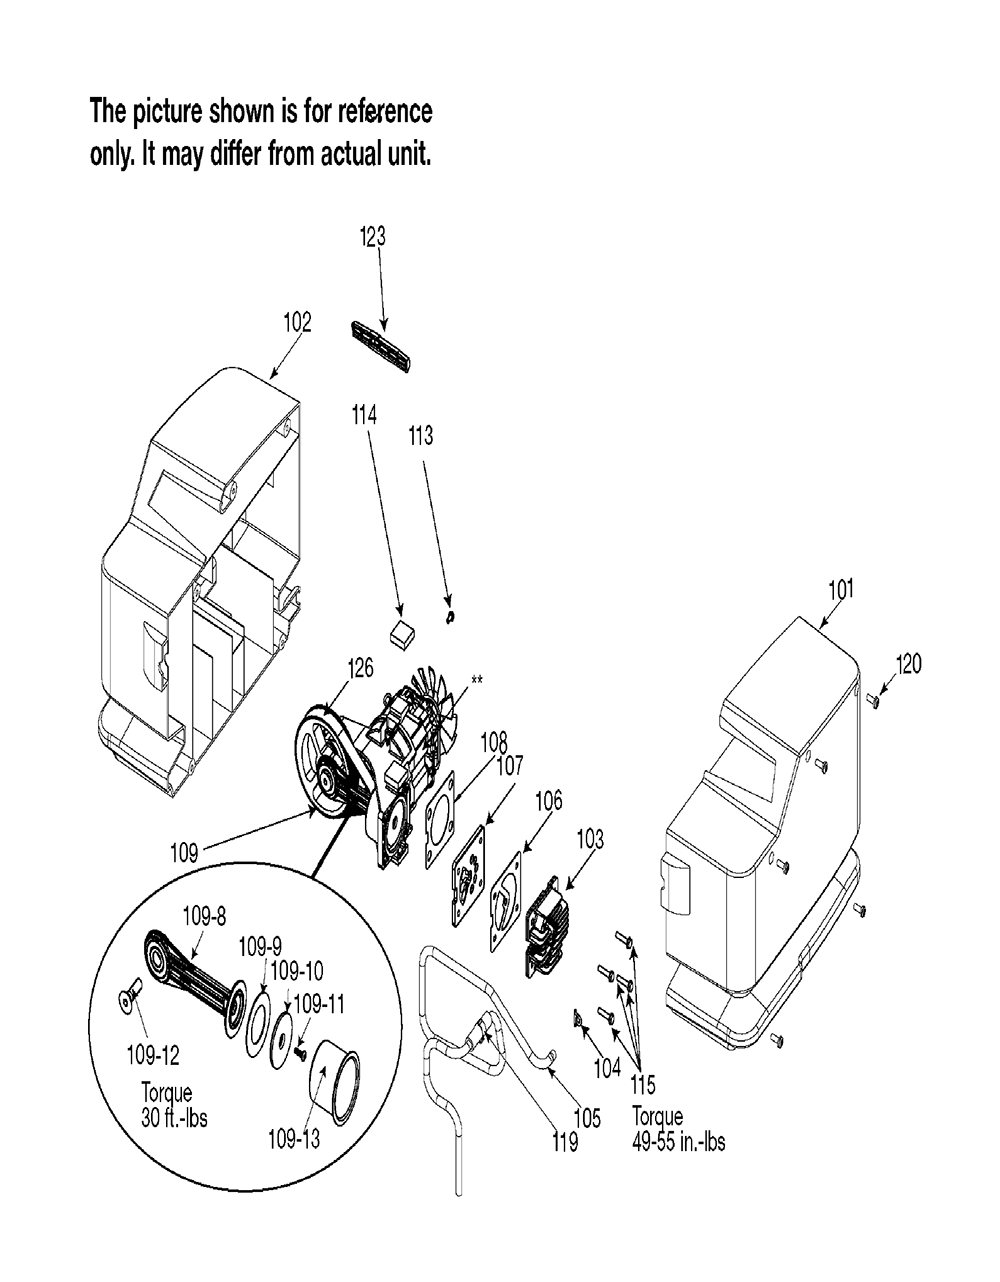 919-72413-BlackandDecker-T1-PB-1Break Down